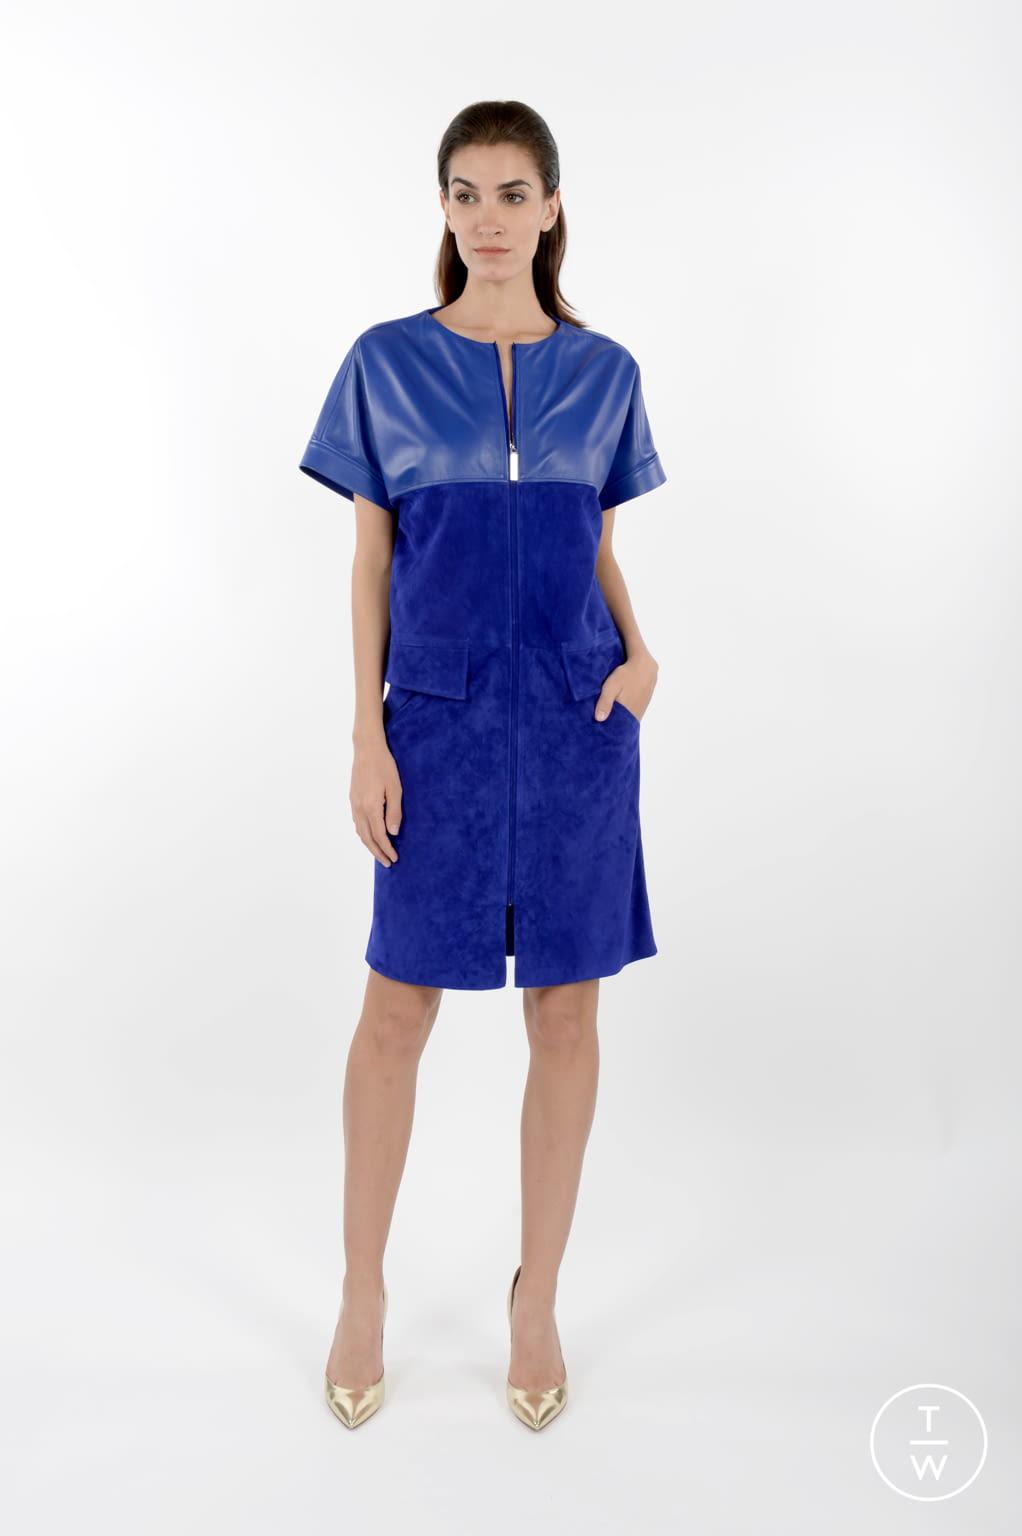 Fashion Week Paris Spring/Summer 2017 look 21 de la collection Maison Ullens womenswear